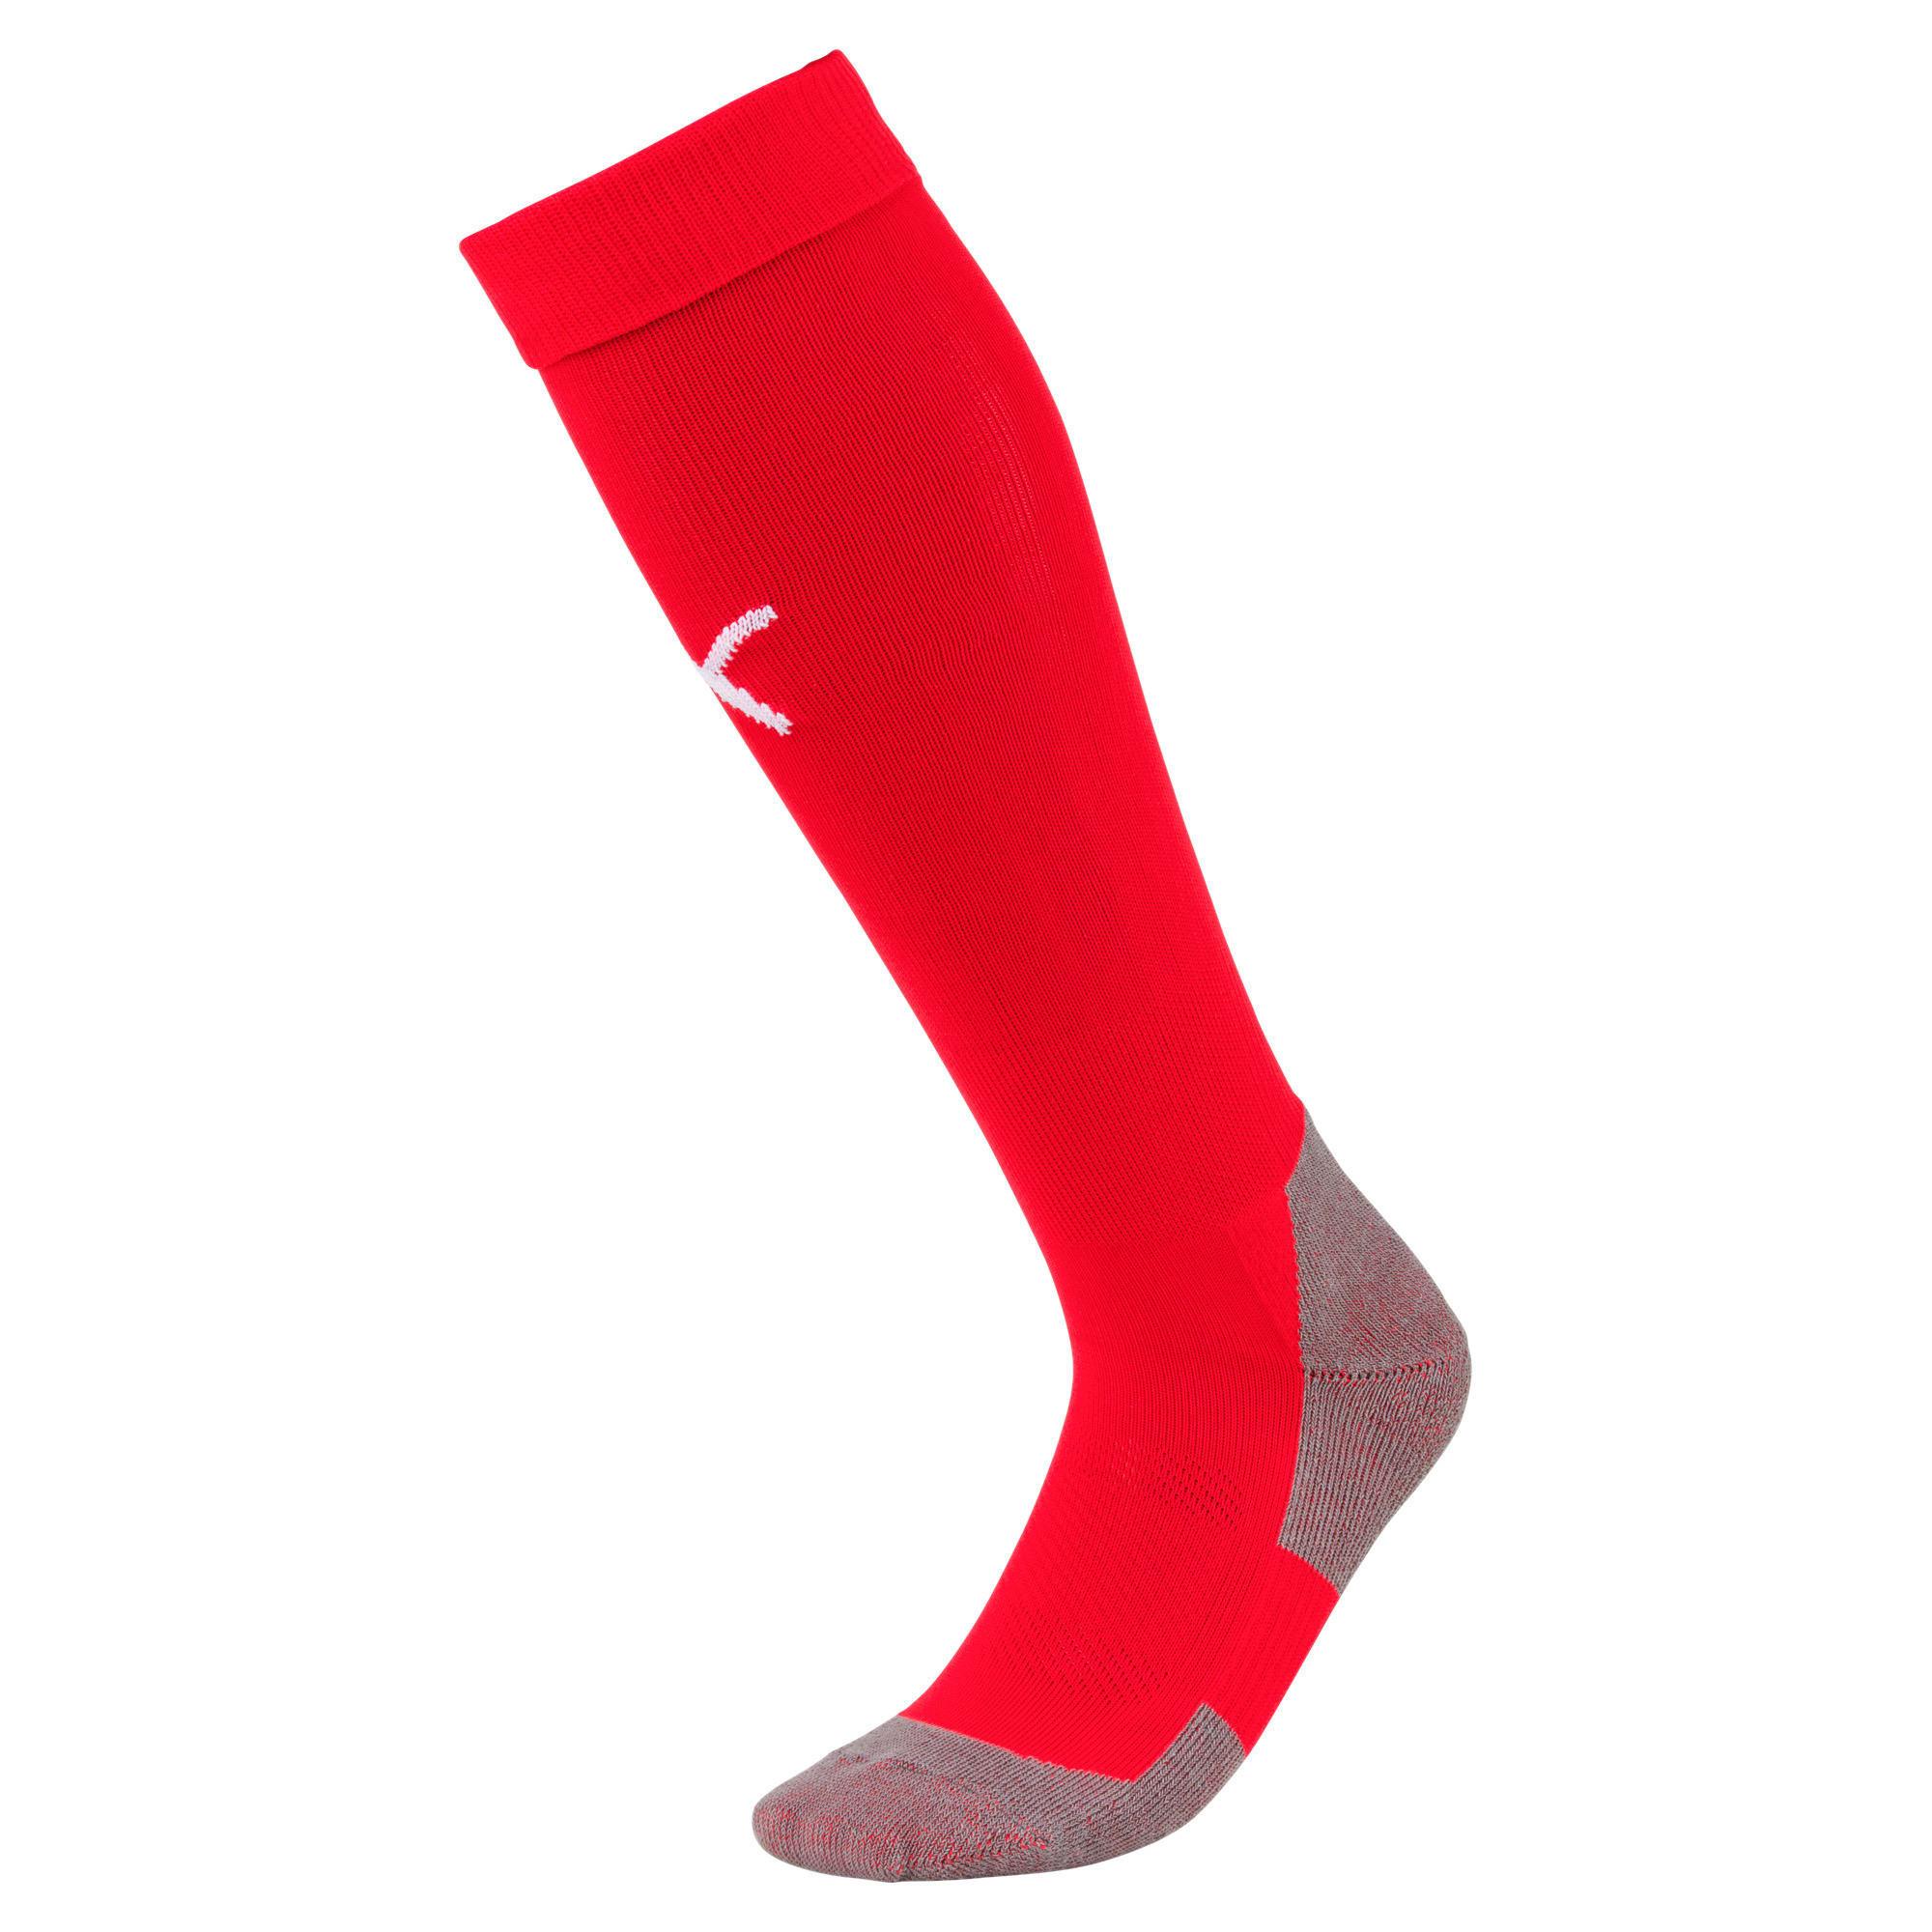 Thumbnail 1 of Football Men's LIGA Core Socks, Puma Red-Puma White, medium